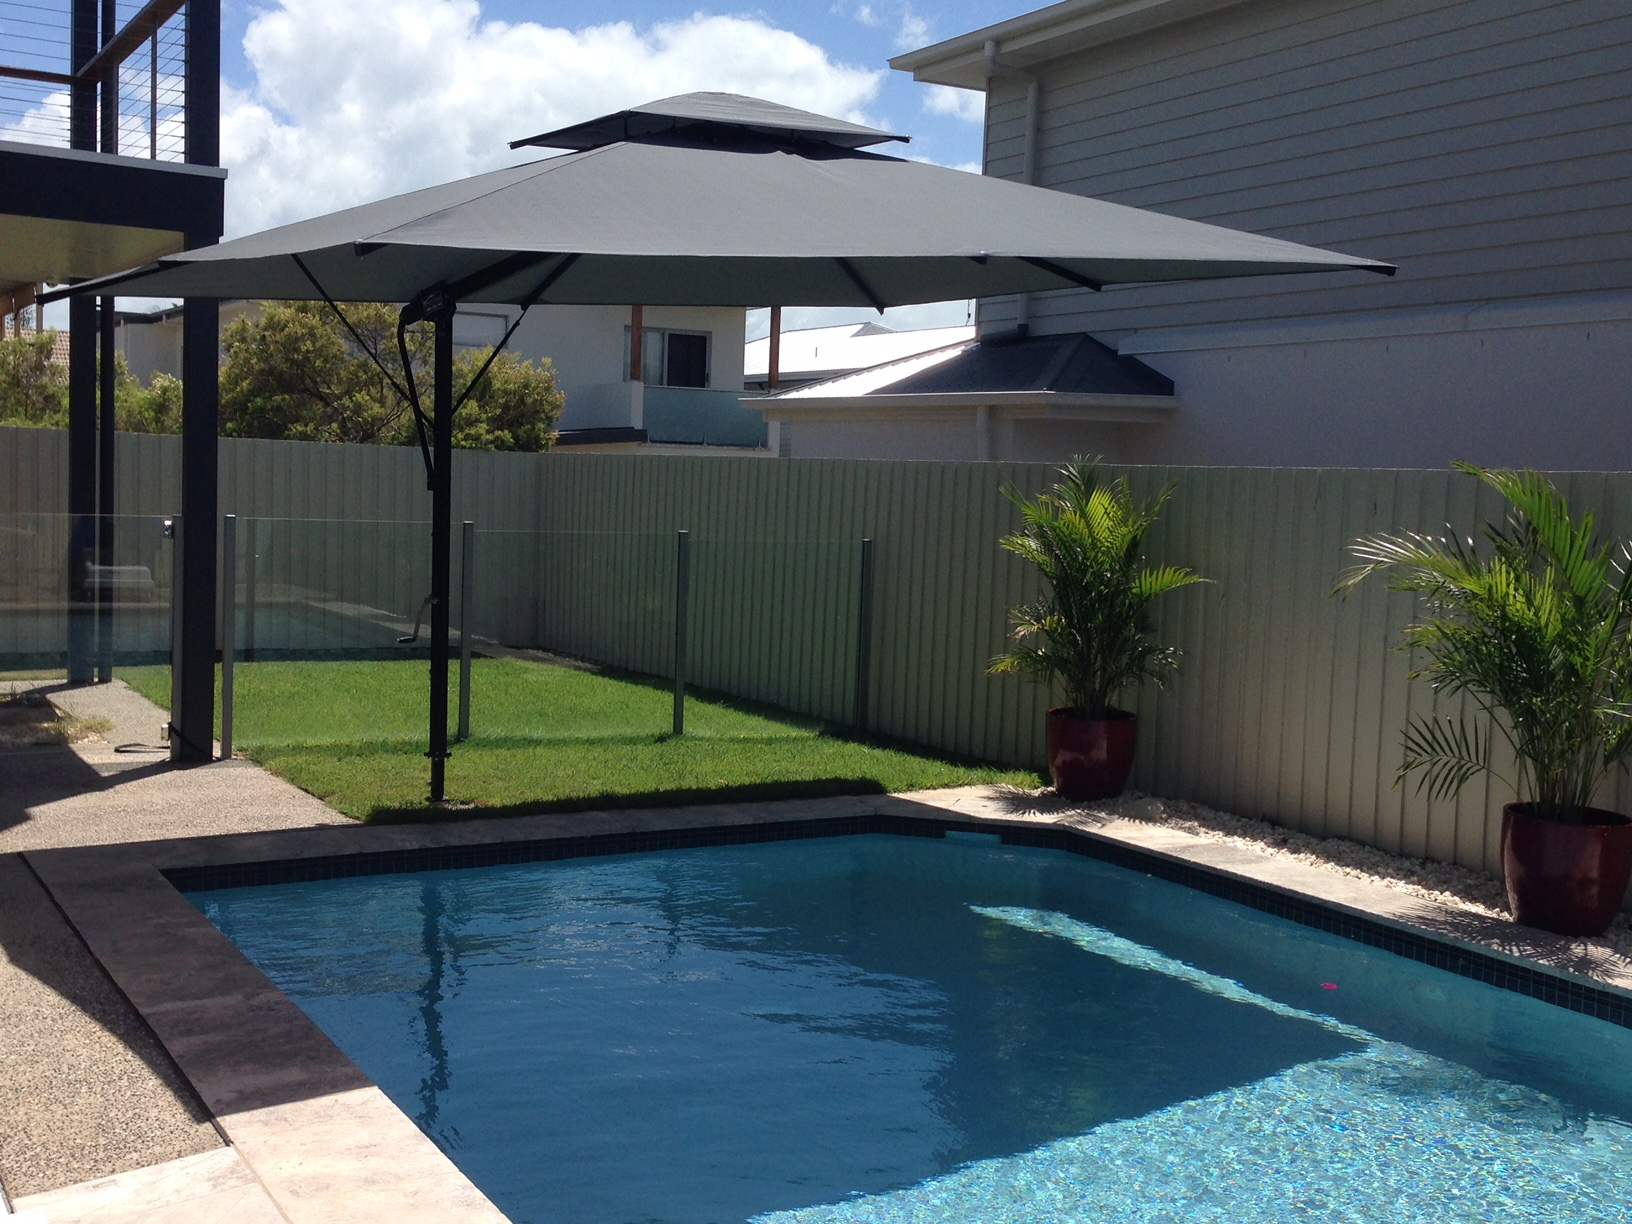 Keren 39 s top 3 qld pool umbrella installations tropicover for Architecture upbrella